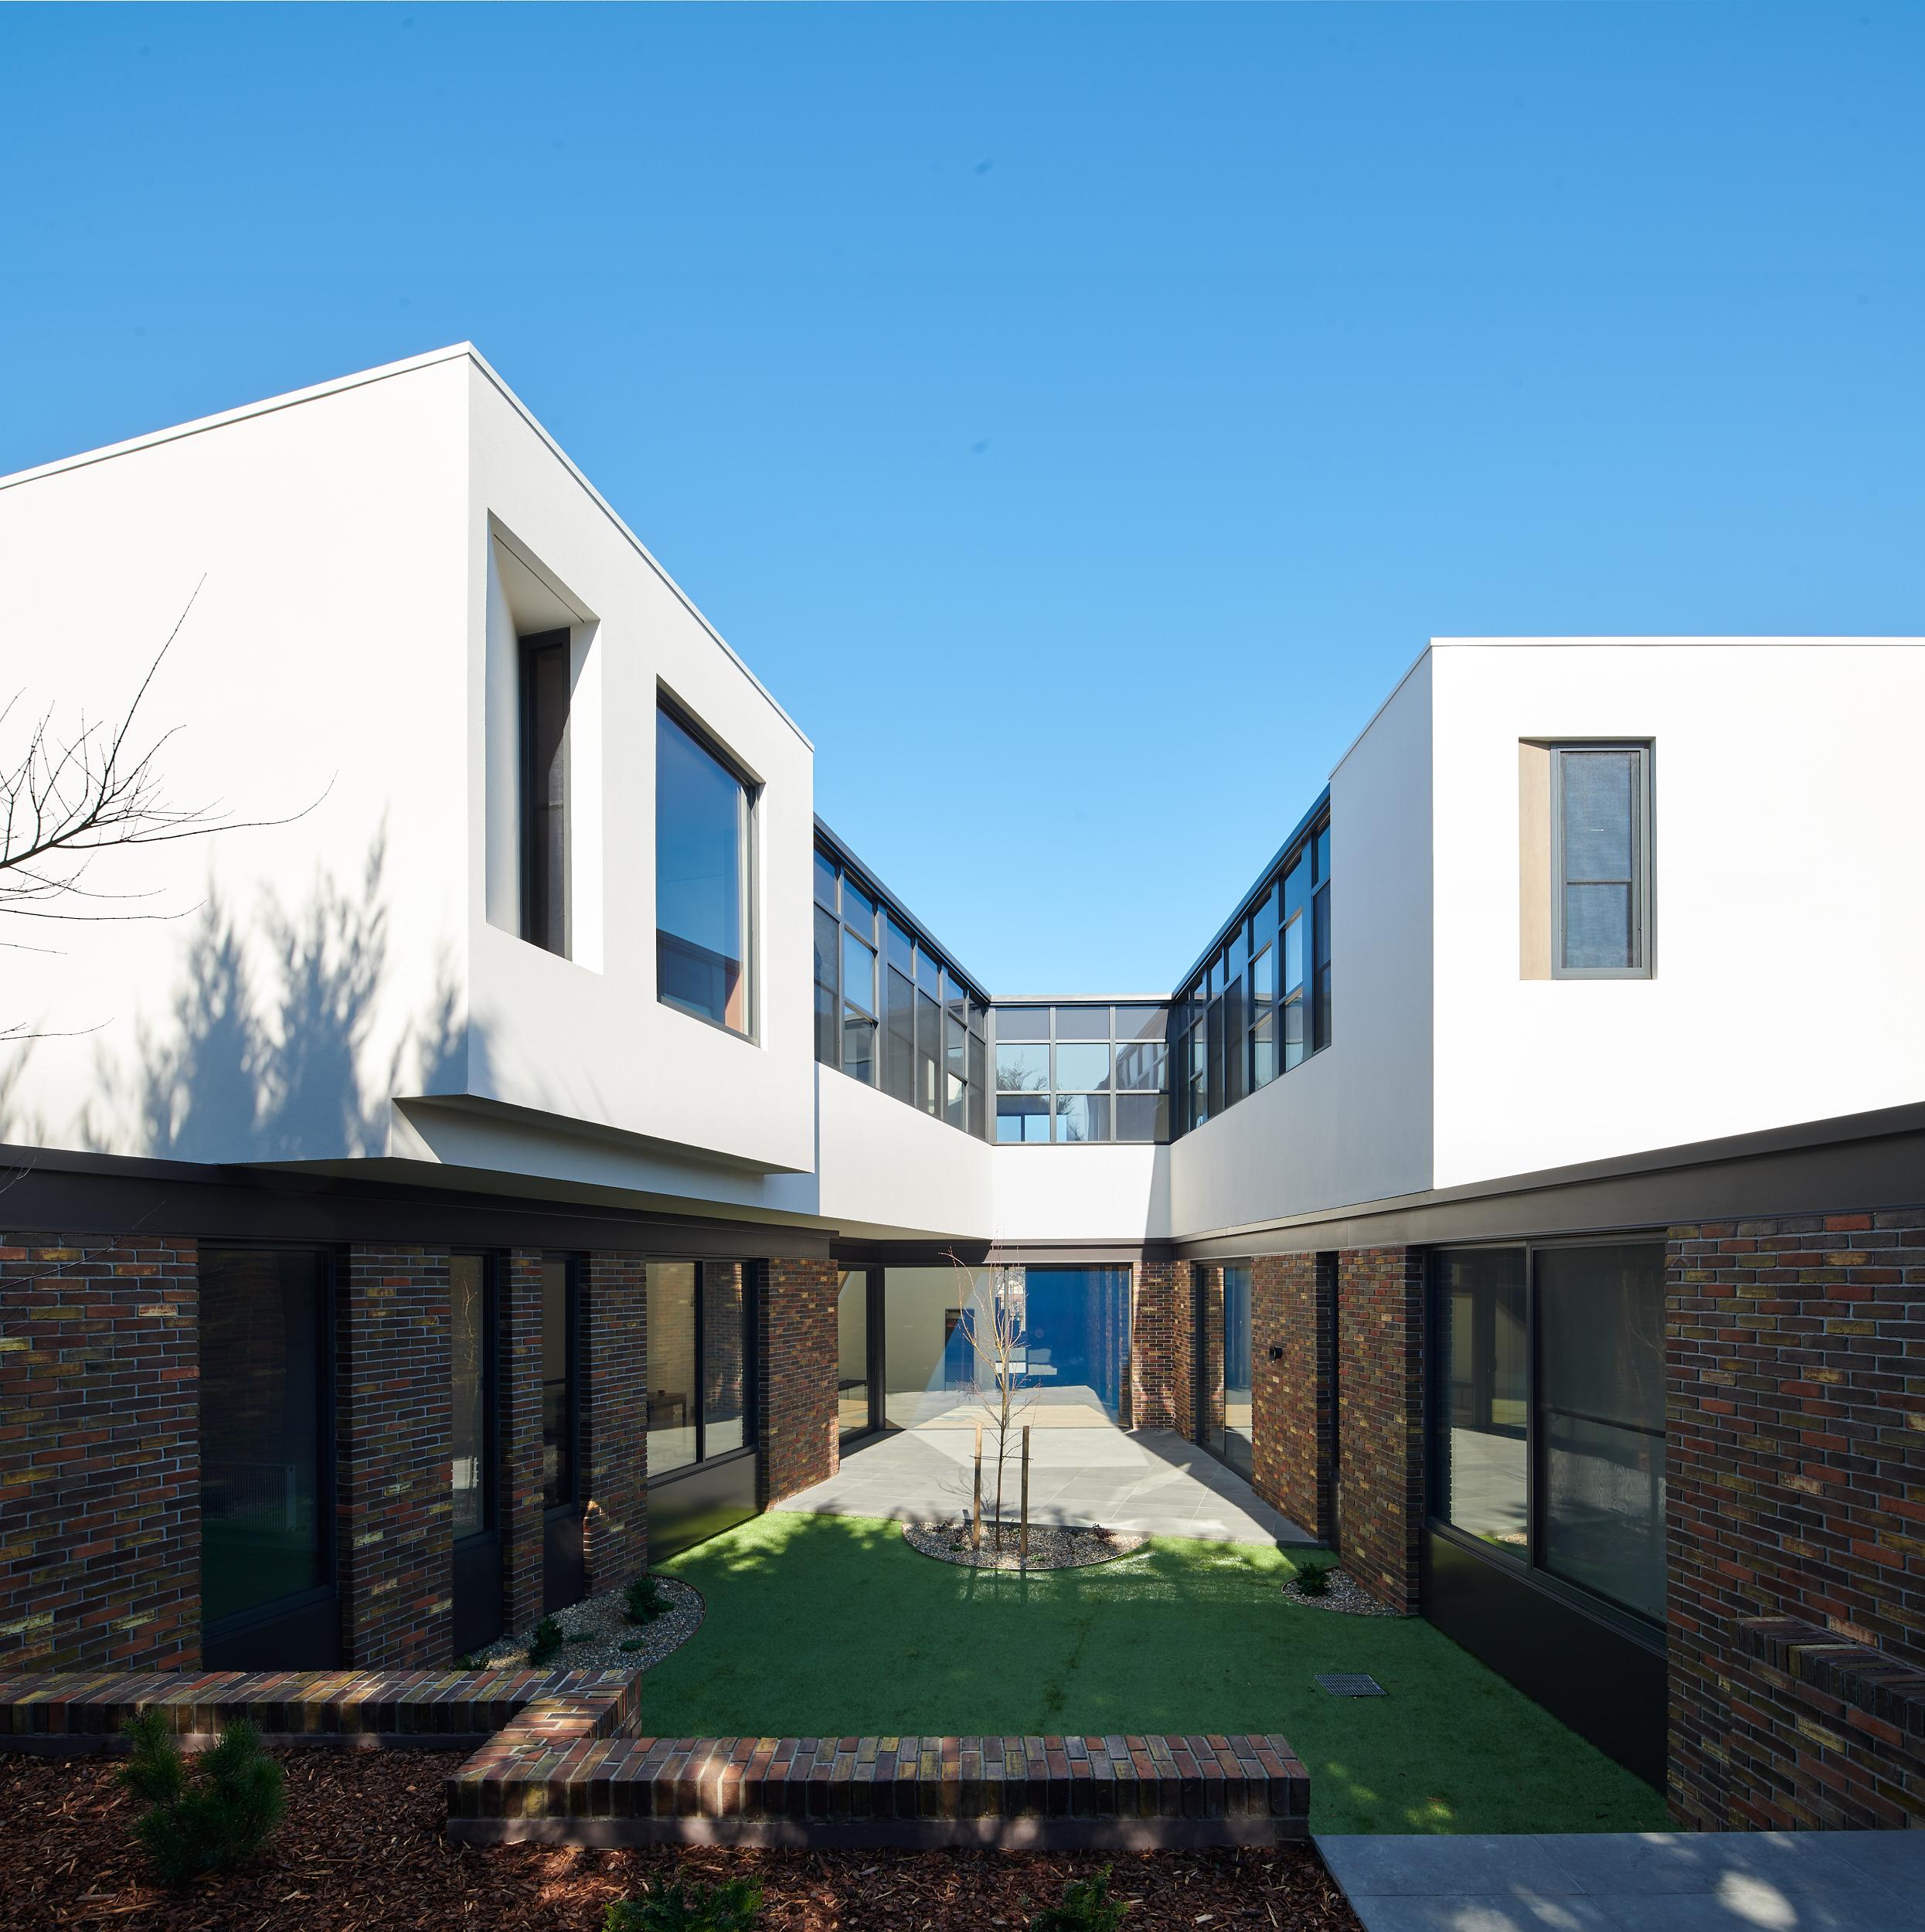 All Seasons House by Bayley Ward